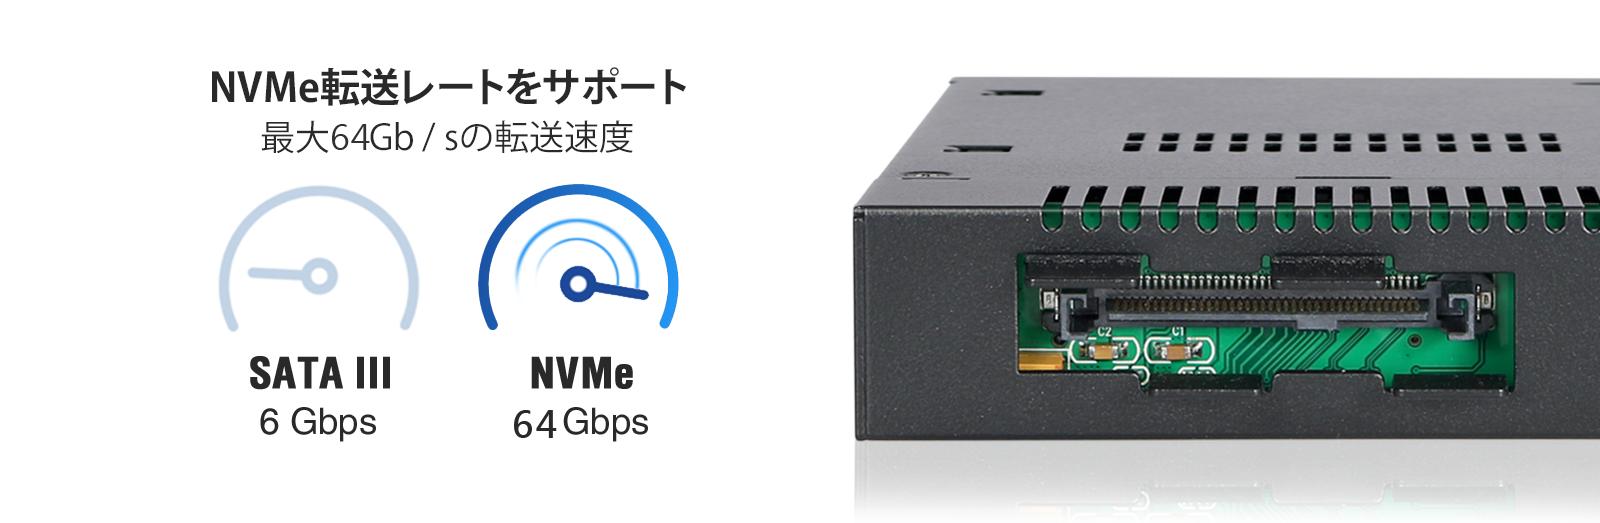 mb601vk-1b NVMe 32Gbps の転送速度に対応